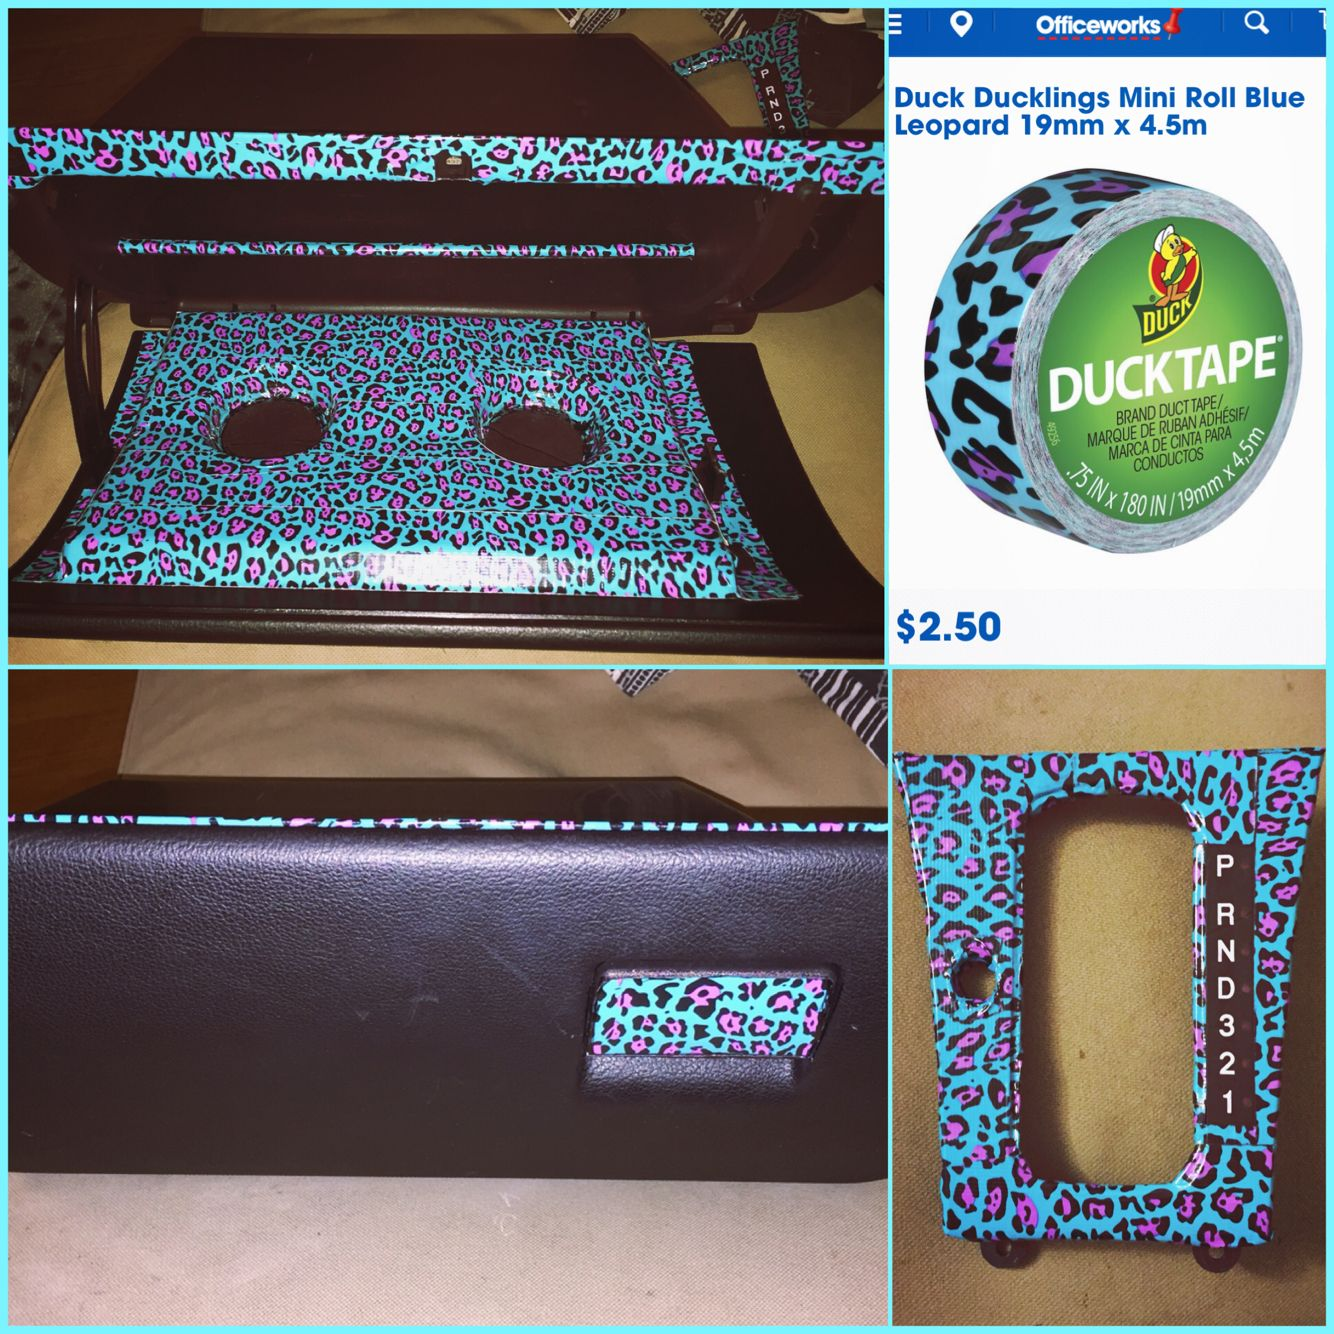 Car interior necessities - Diy Car Interior Decor Leopard Cheetah Print Duct Tape